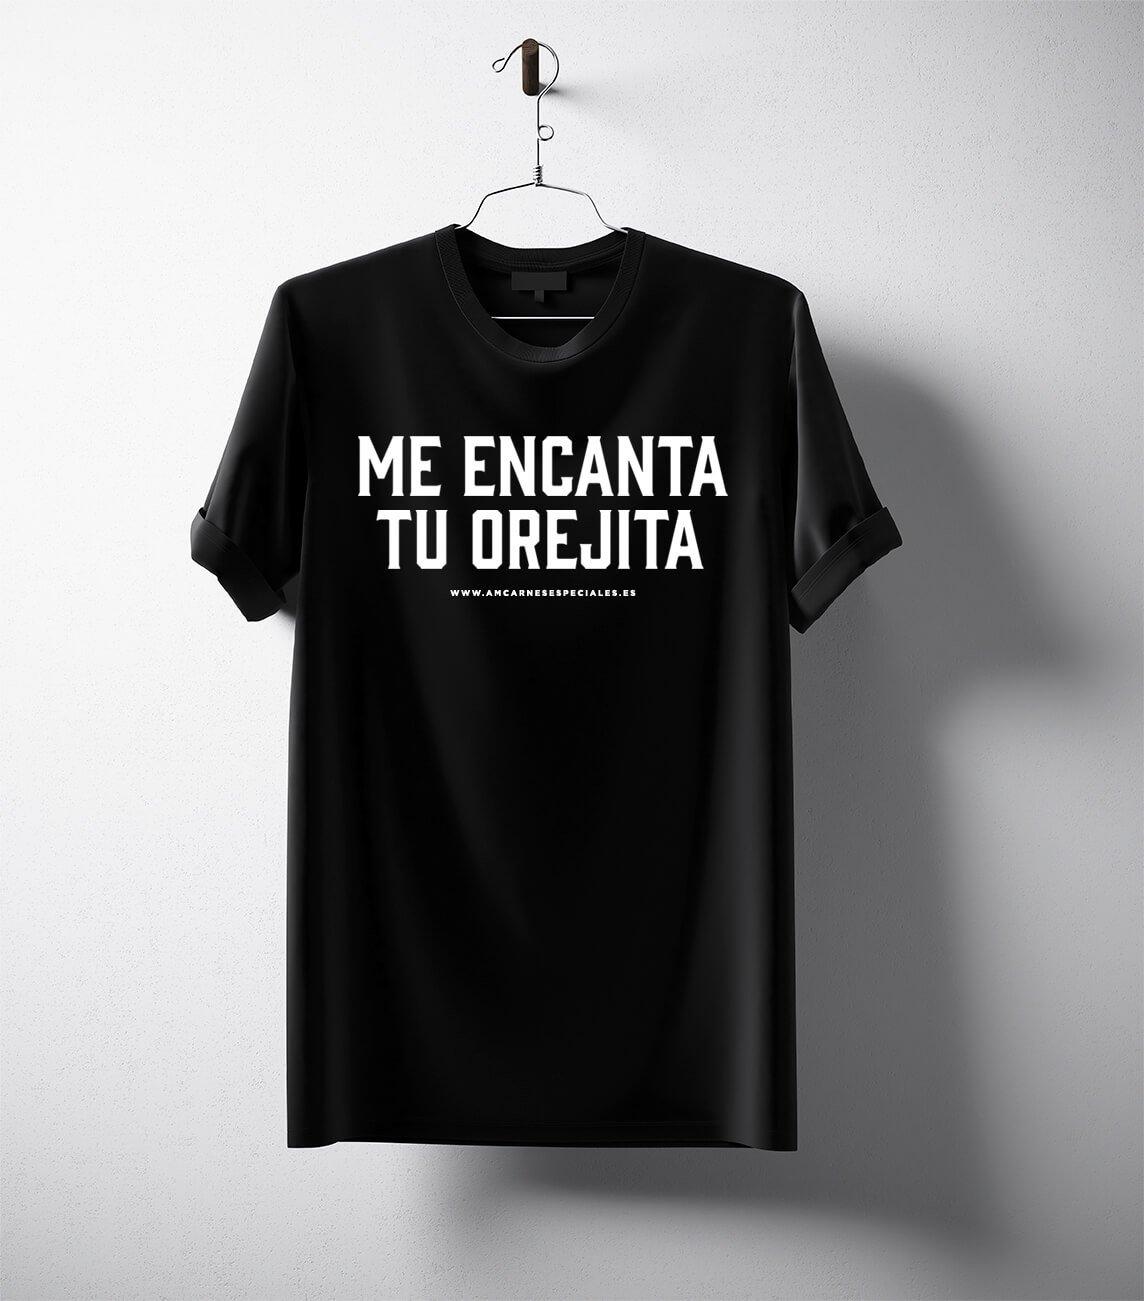 merchandising-camiseta-alejandro-miguel